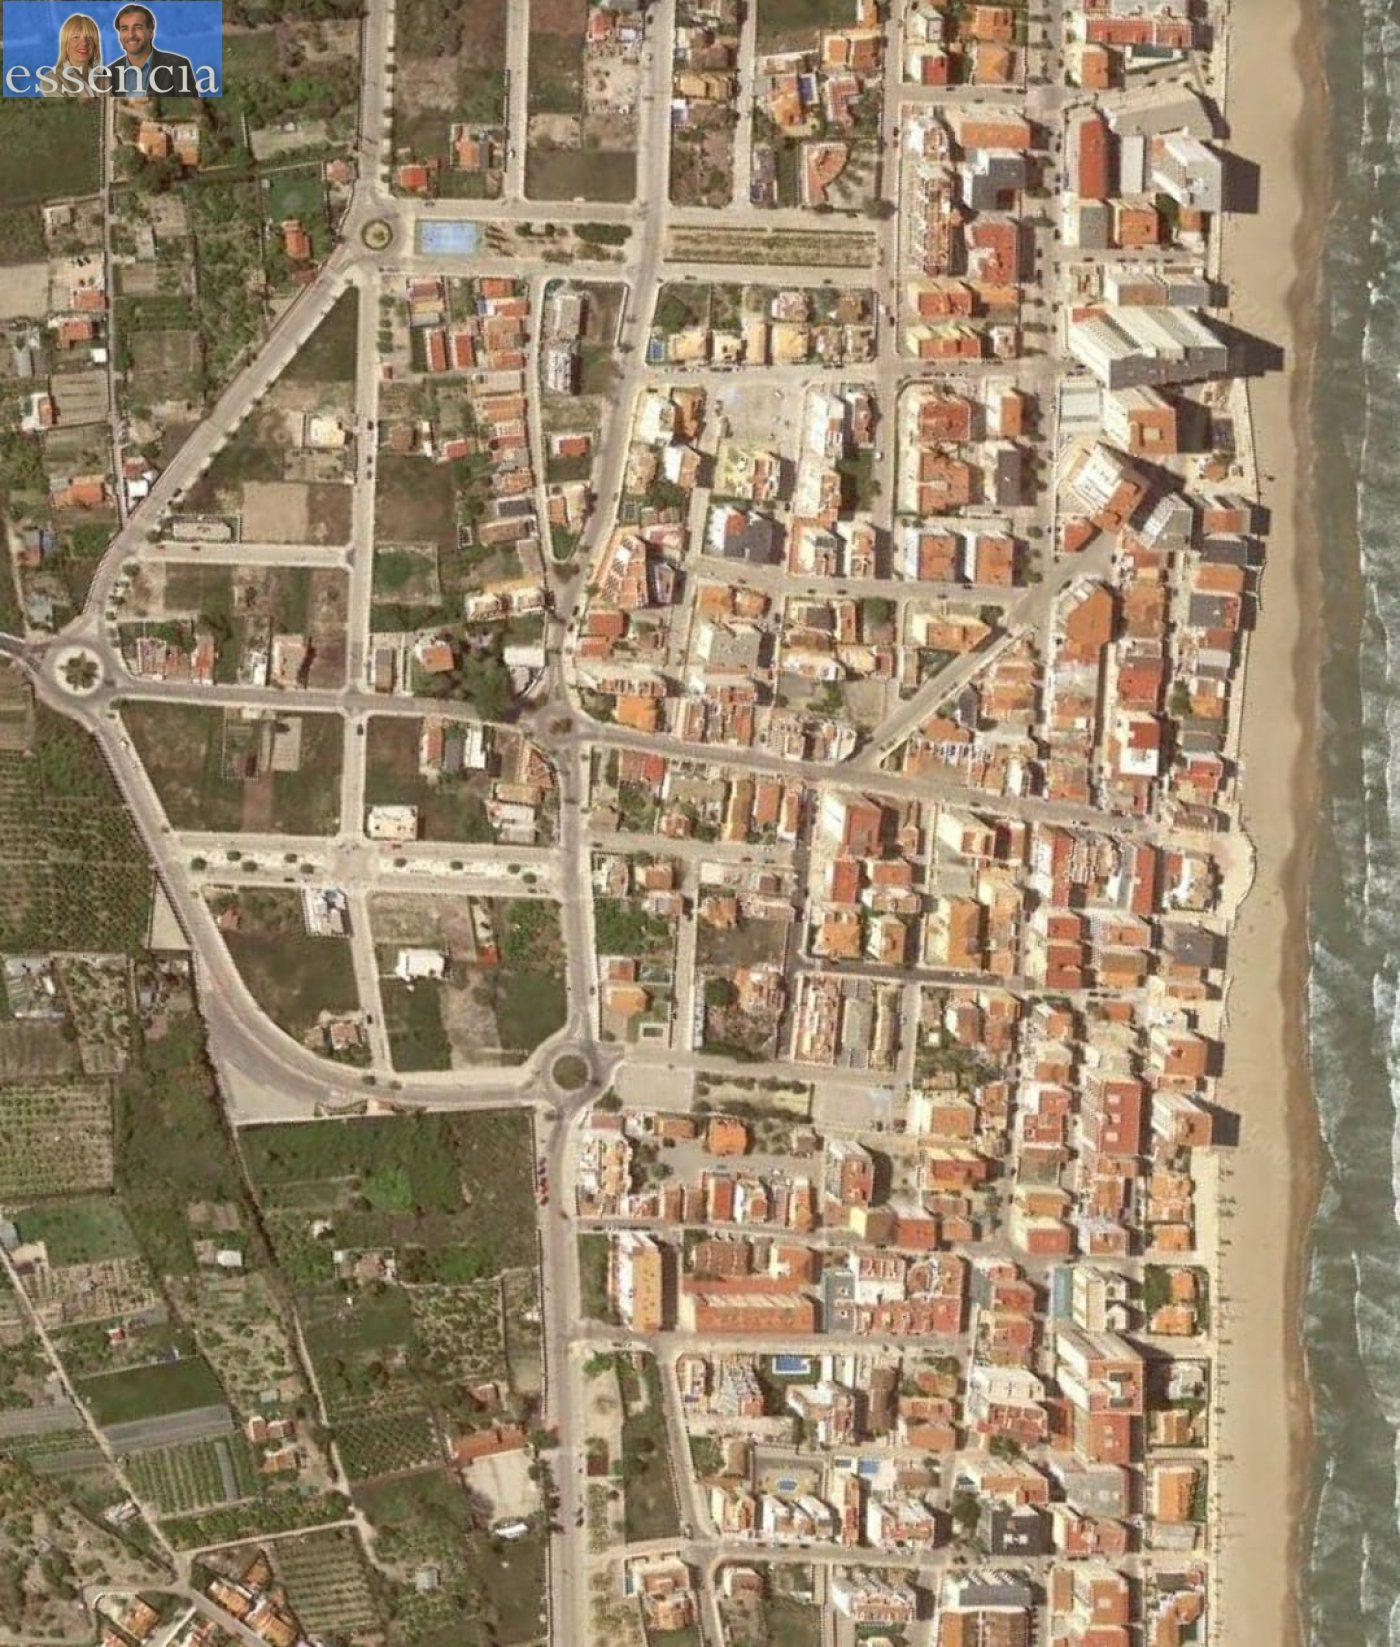 Terreno urbano 400 m2 - imagenInmueble0